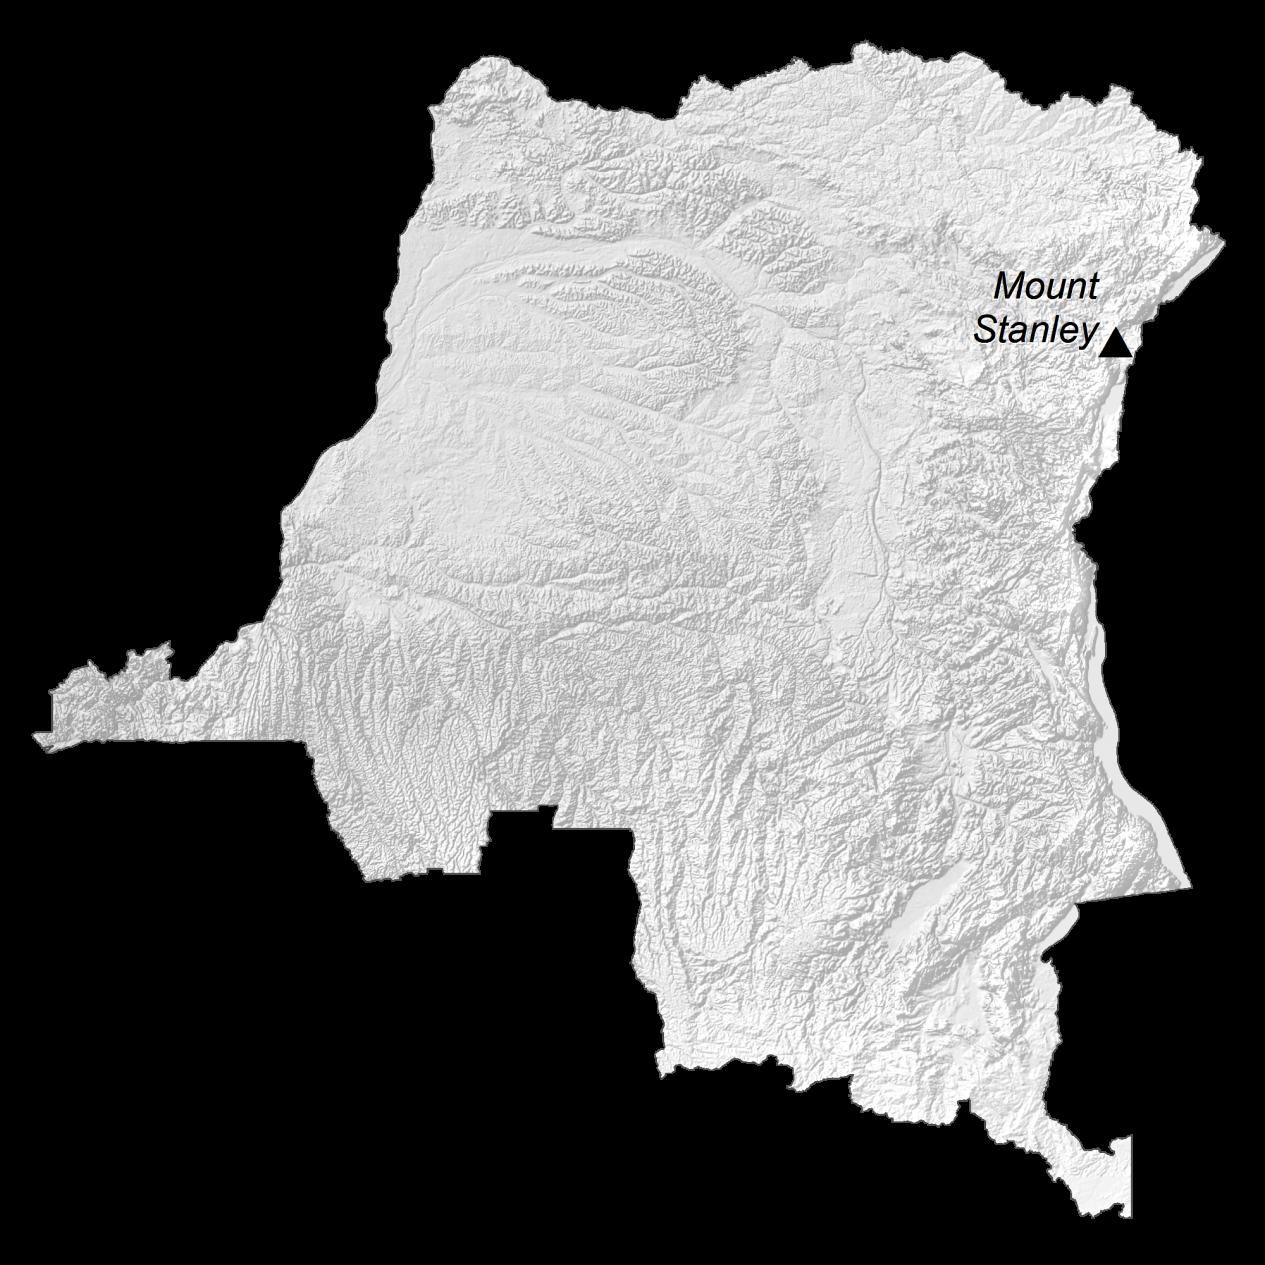 Democratic Republic of Congo Elevation Map